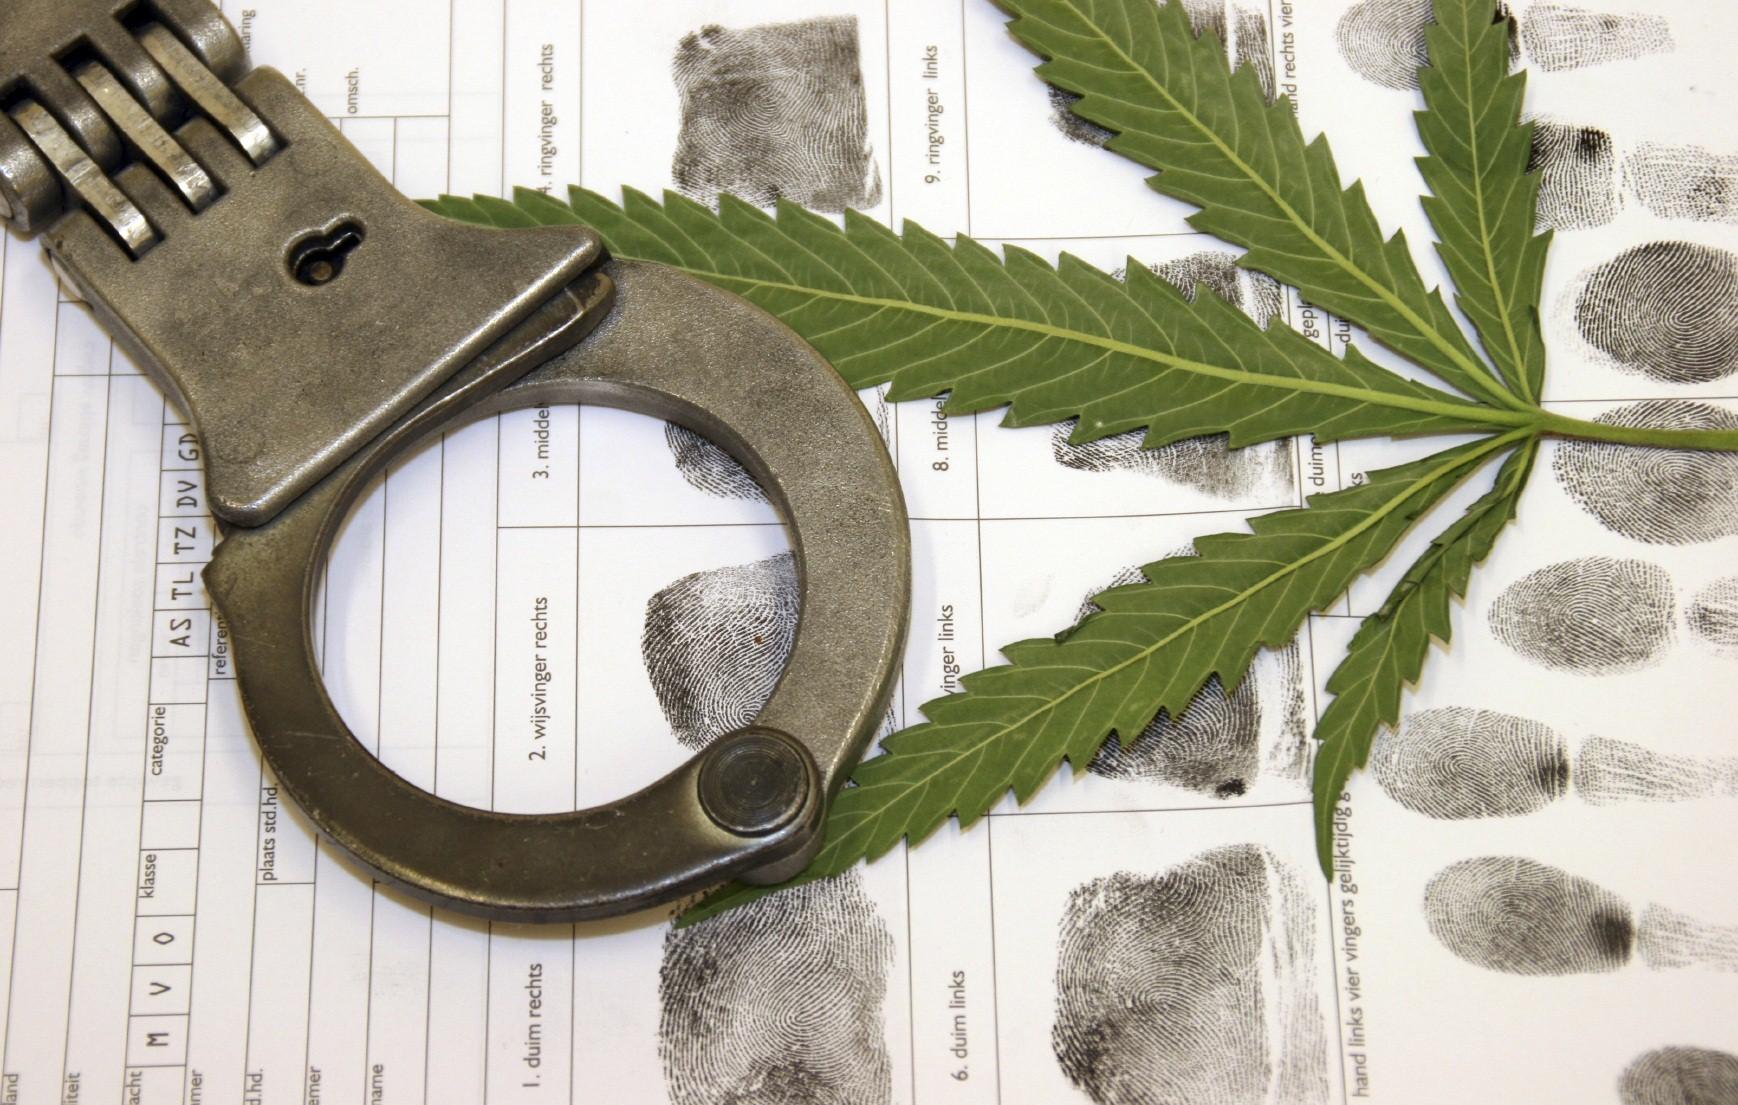 Austin Marijuana Lawyer - Call 512-827-7767 - Free